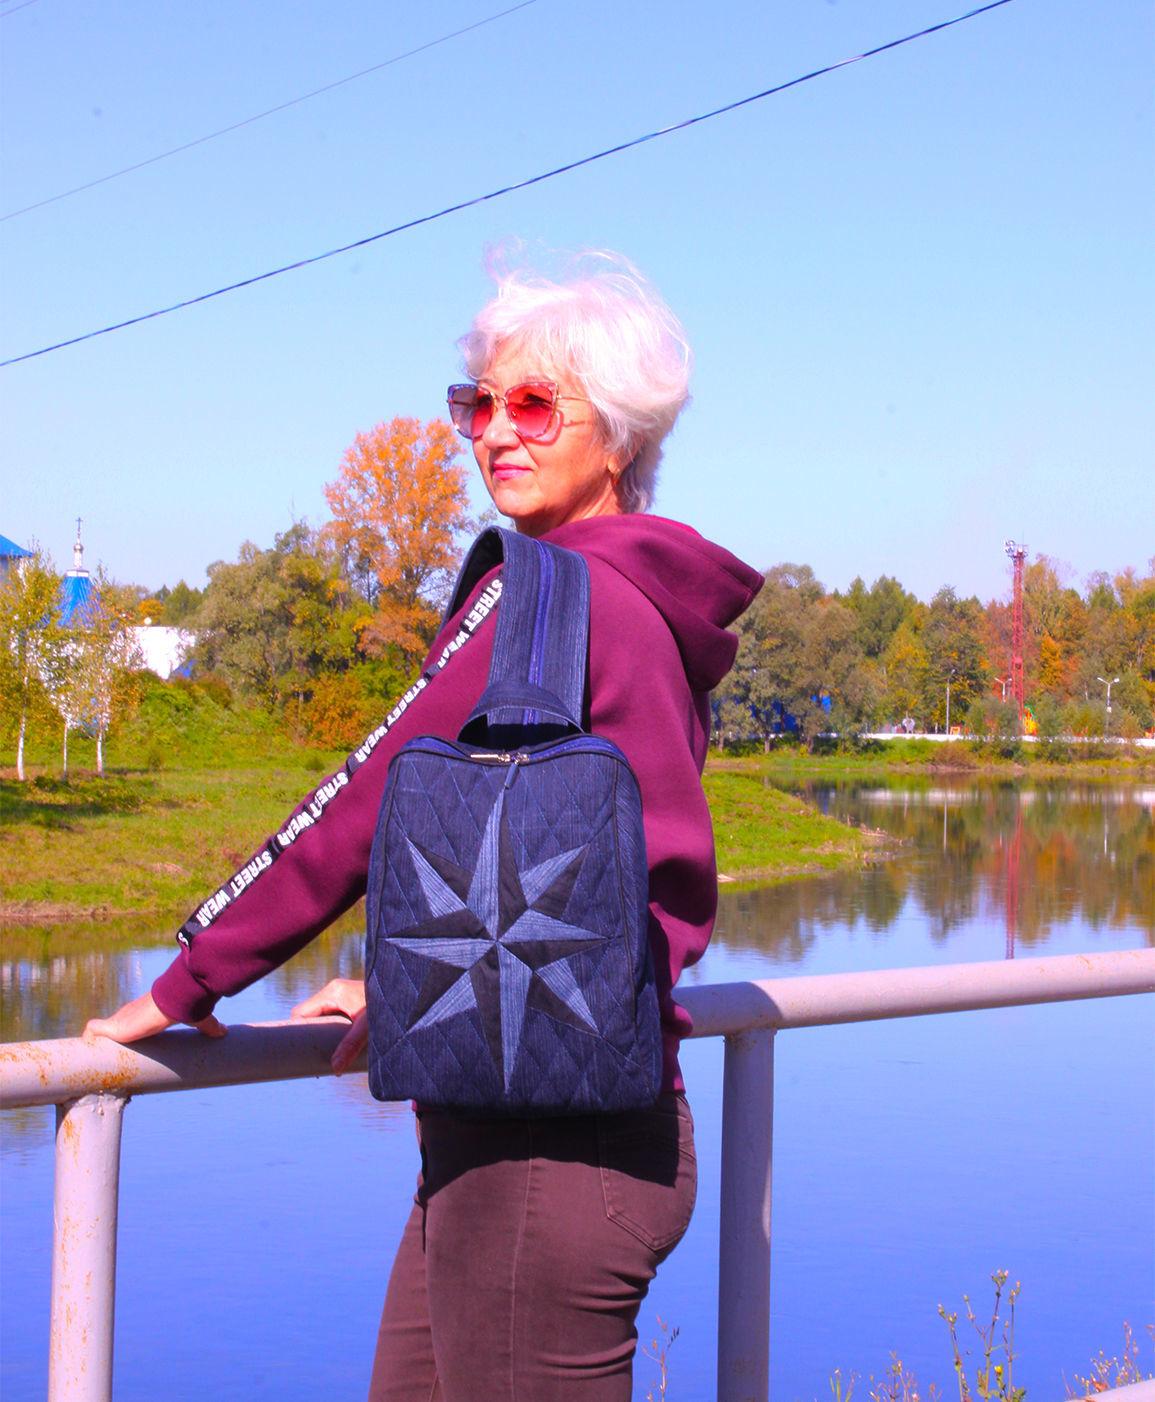 Джинсовый рюкзак Клематис 11, Рюкзаки, Аша, Фото №1